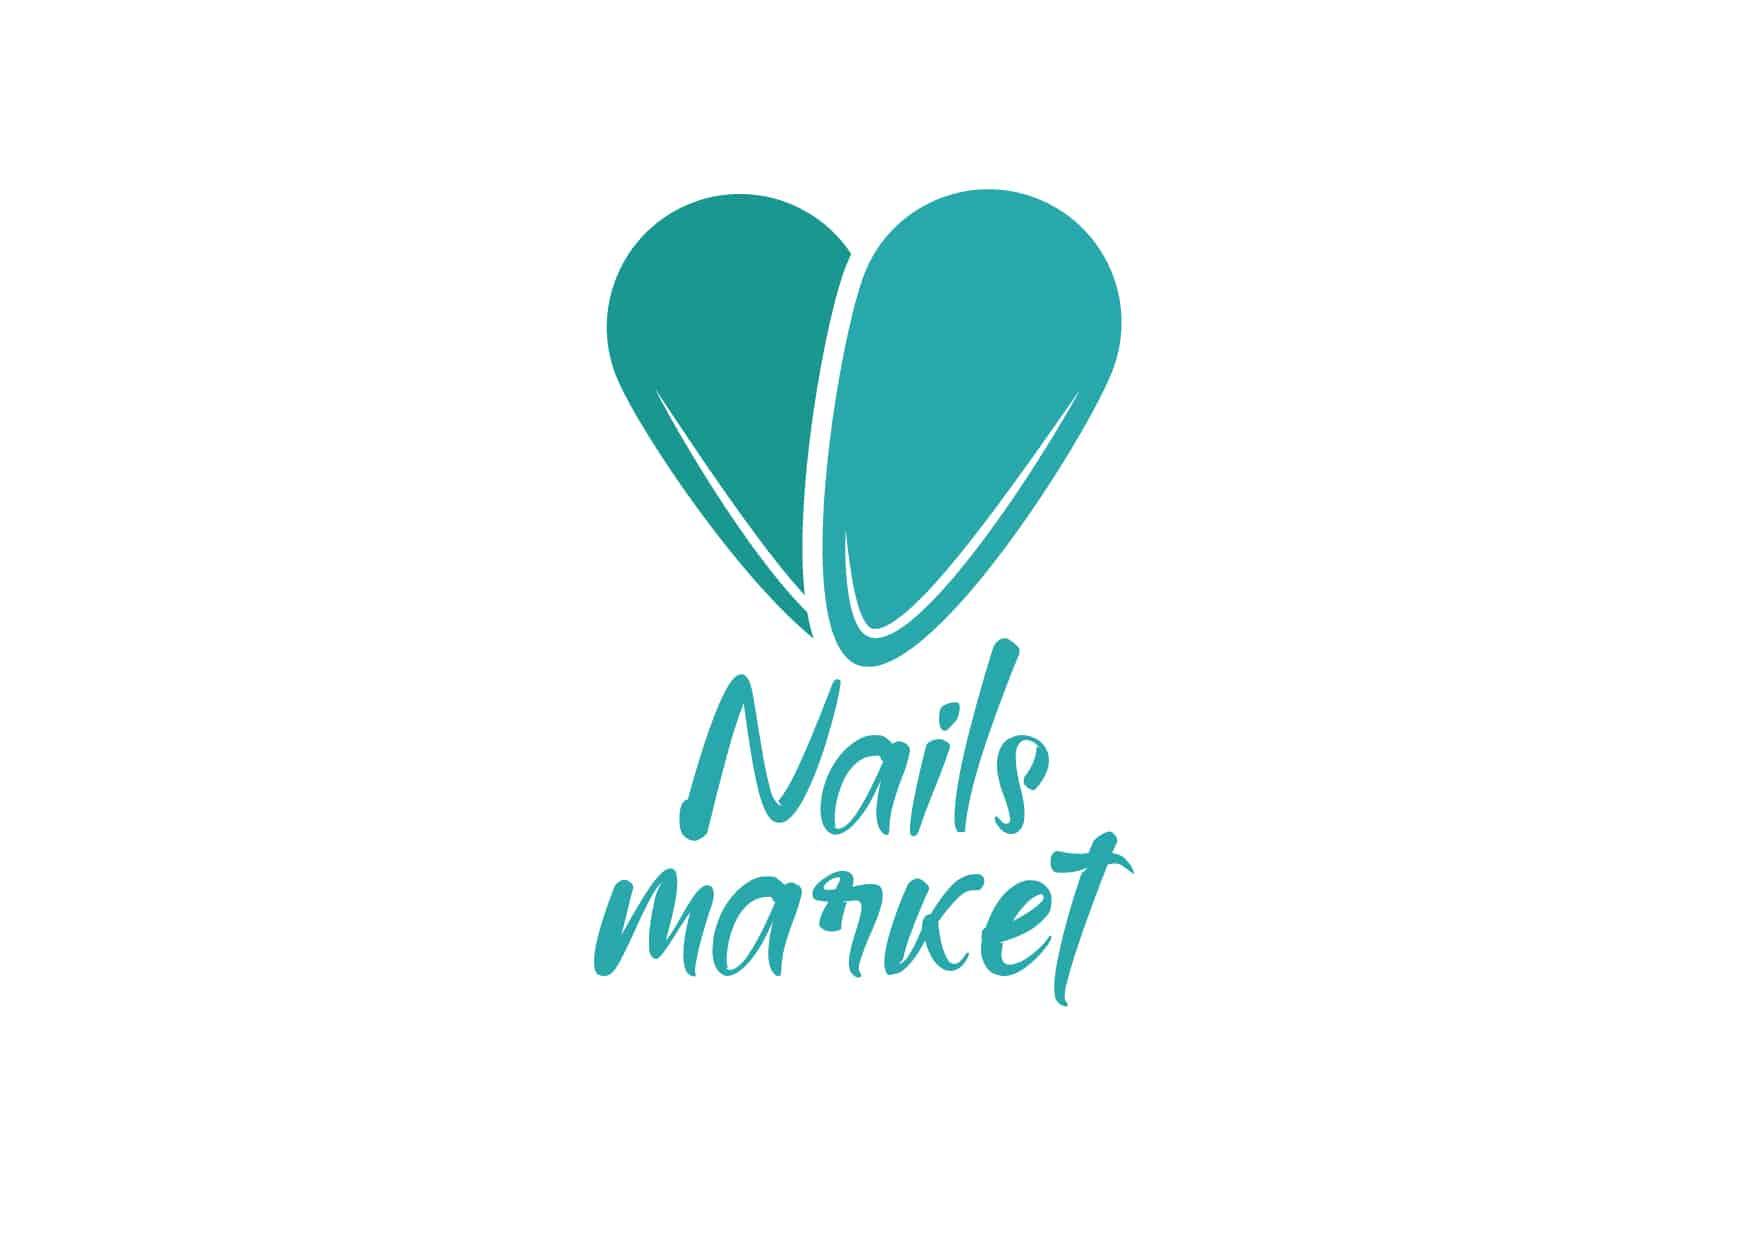 логотип в виде ногтей